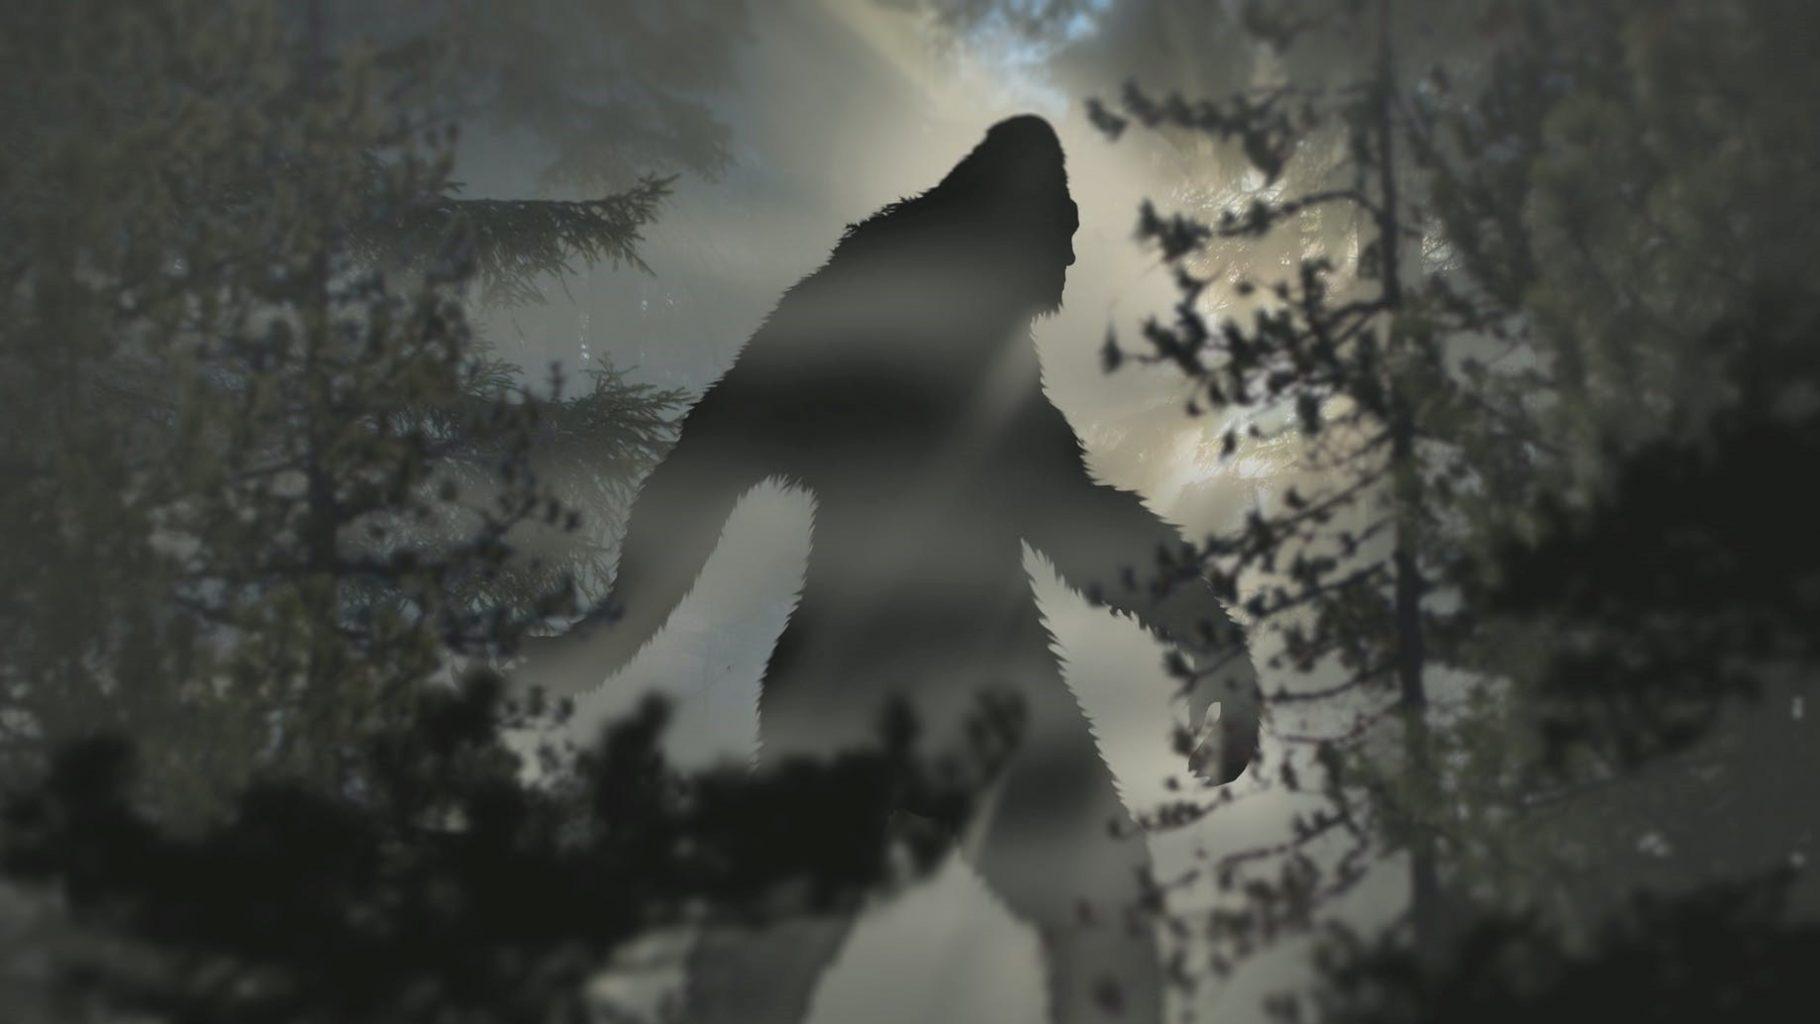 Image: silhouette of bigfoot